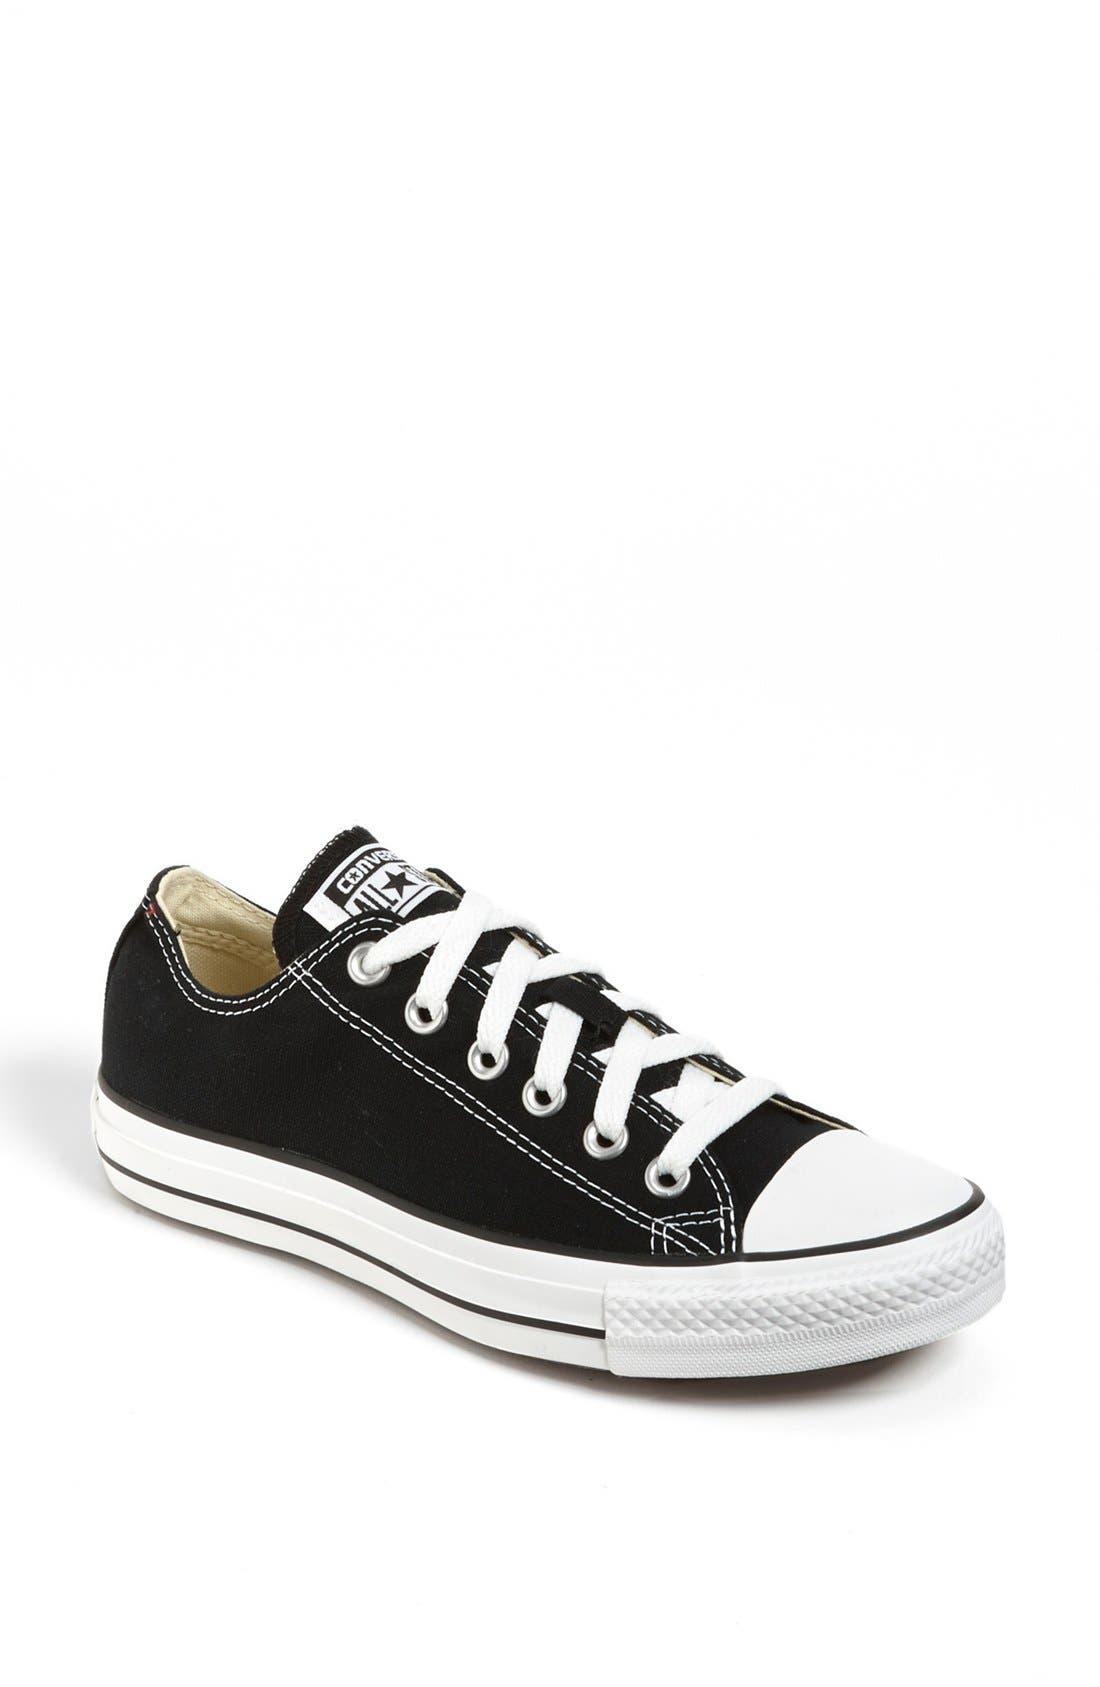 Main Image - Converse Chuck Taylor® Low Top Sneaker (Women)